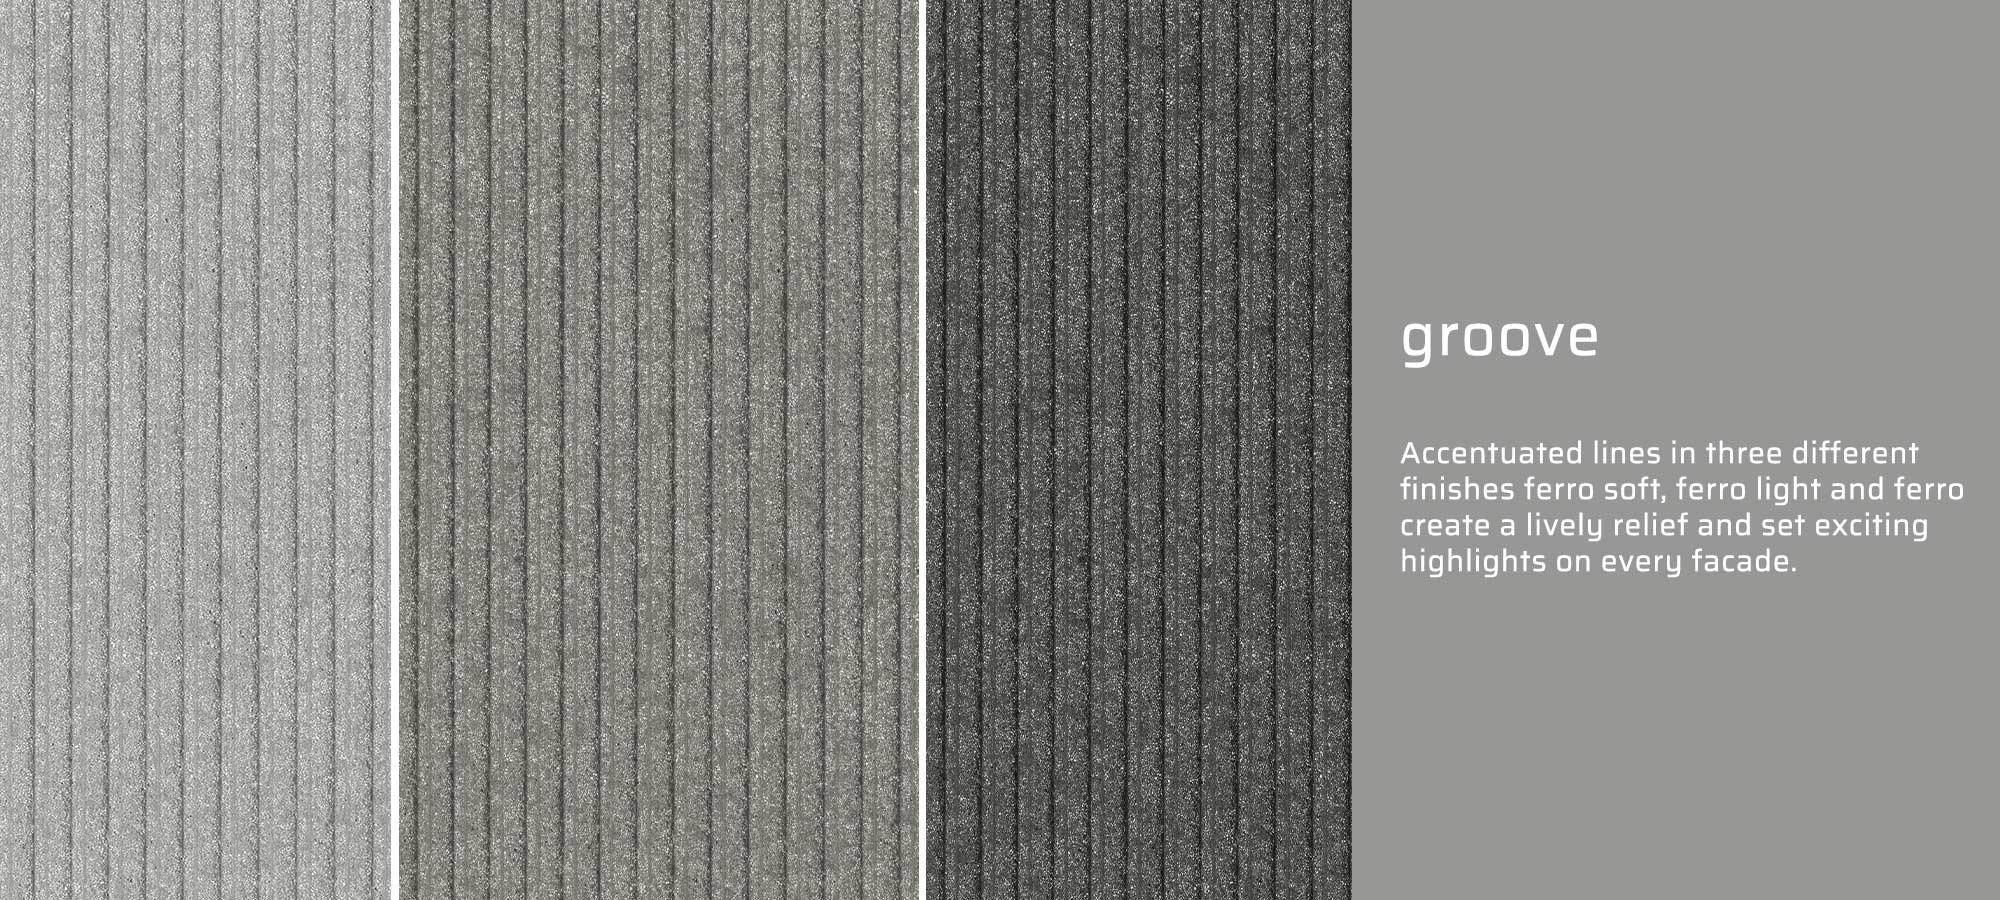 GRC groove texture